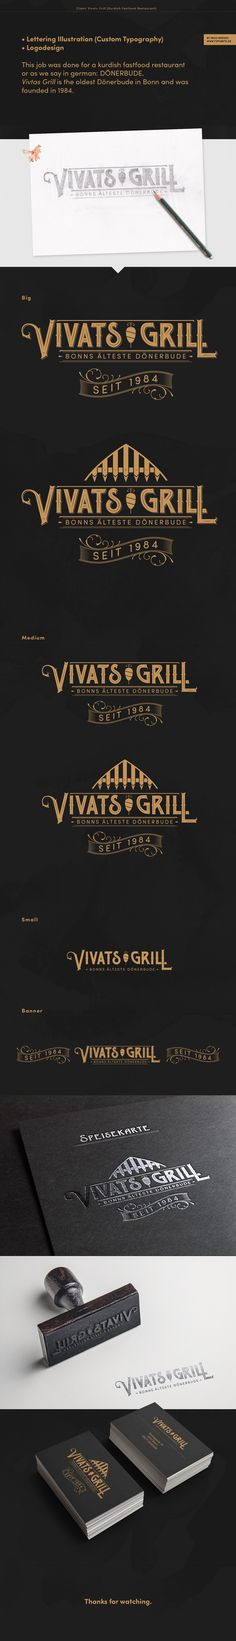 """Vivats Grill Logo"" by Ingo Hermes (www.72punkte.de). Dönerbude, Fastfood, Lettering, Branding, Logo"